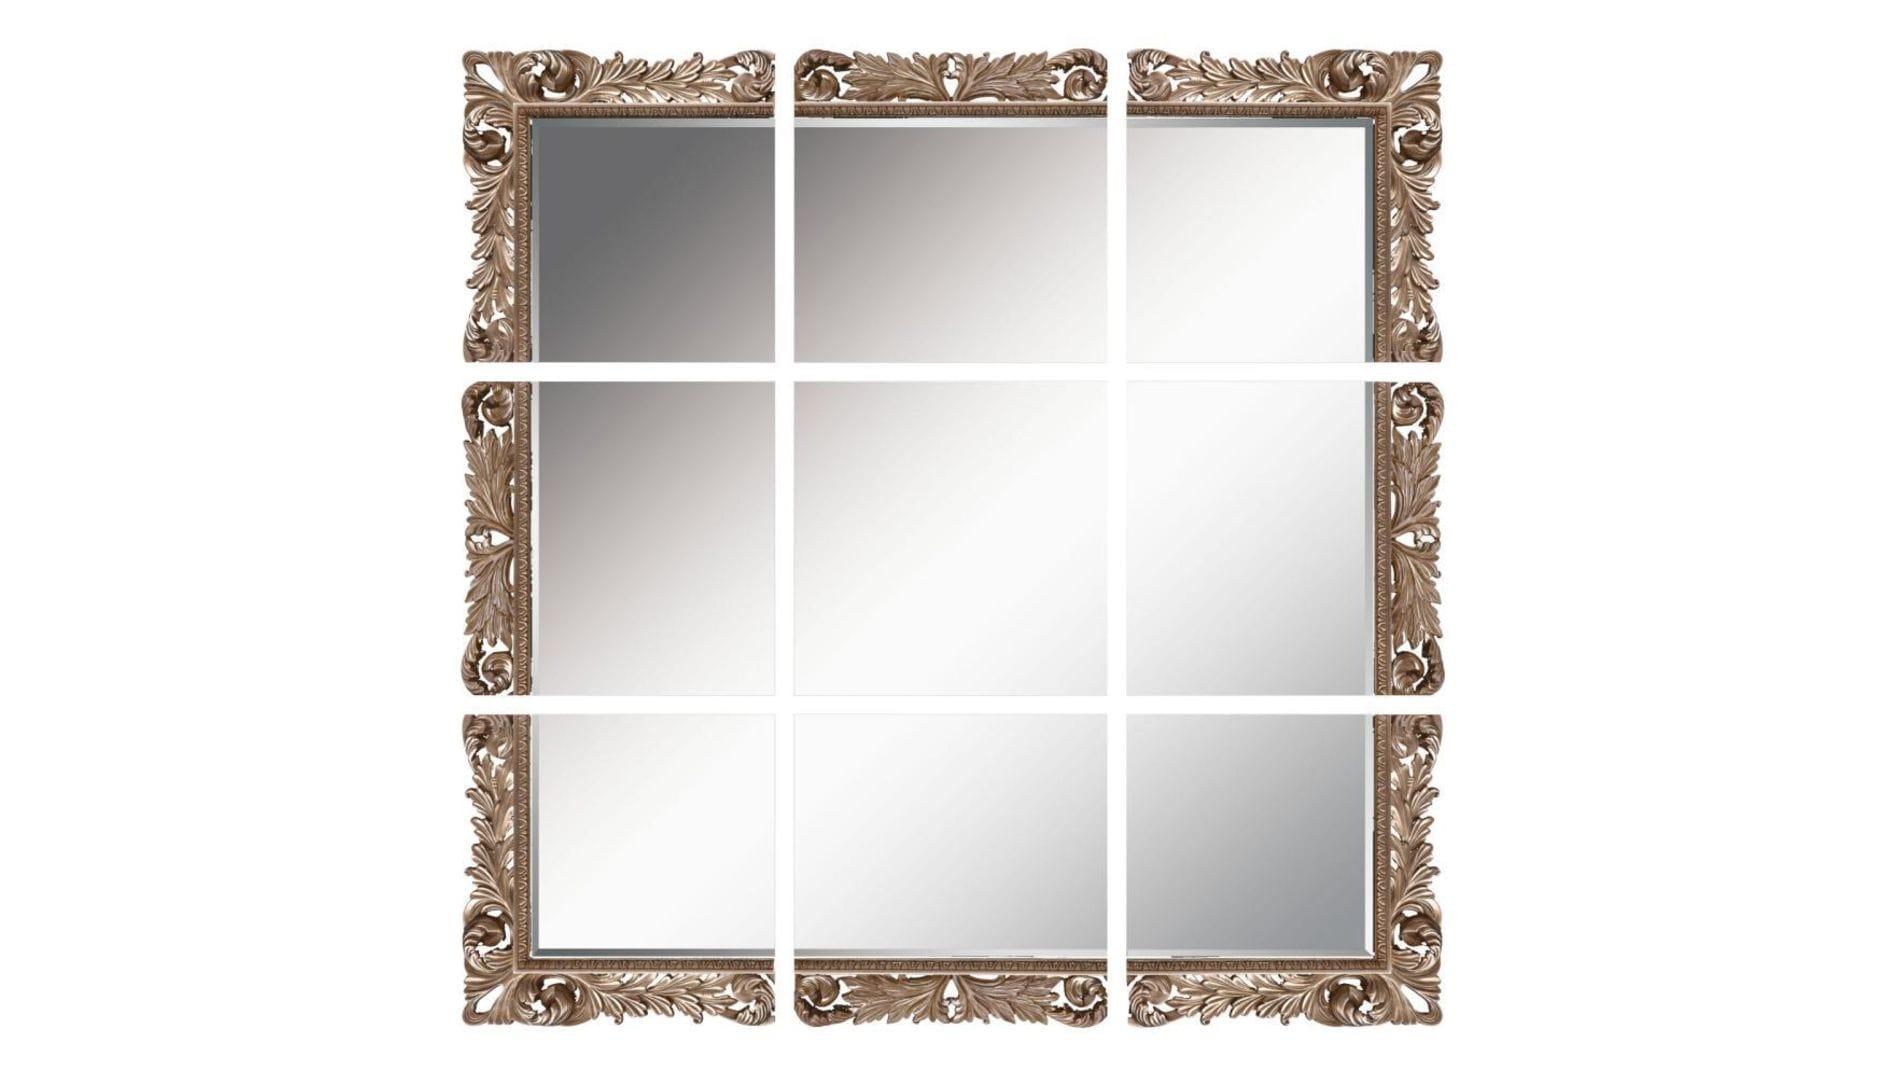 Зеркало Gold - крайний элемент